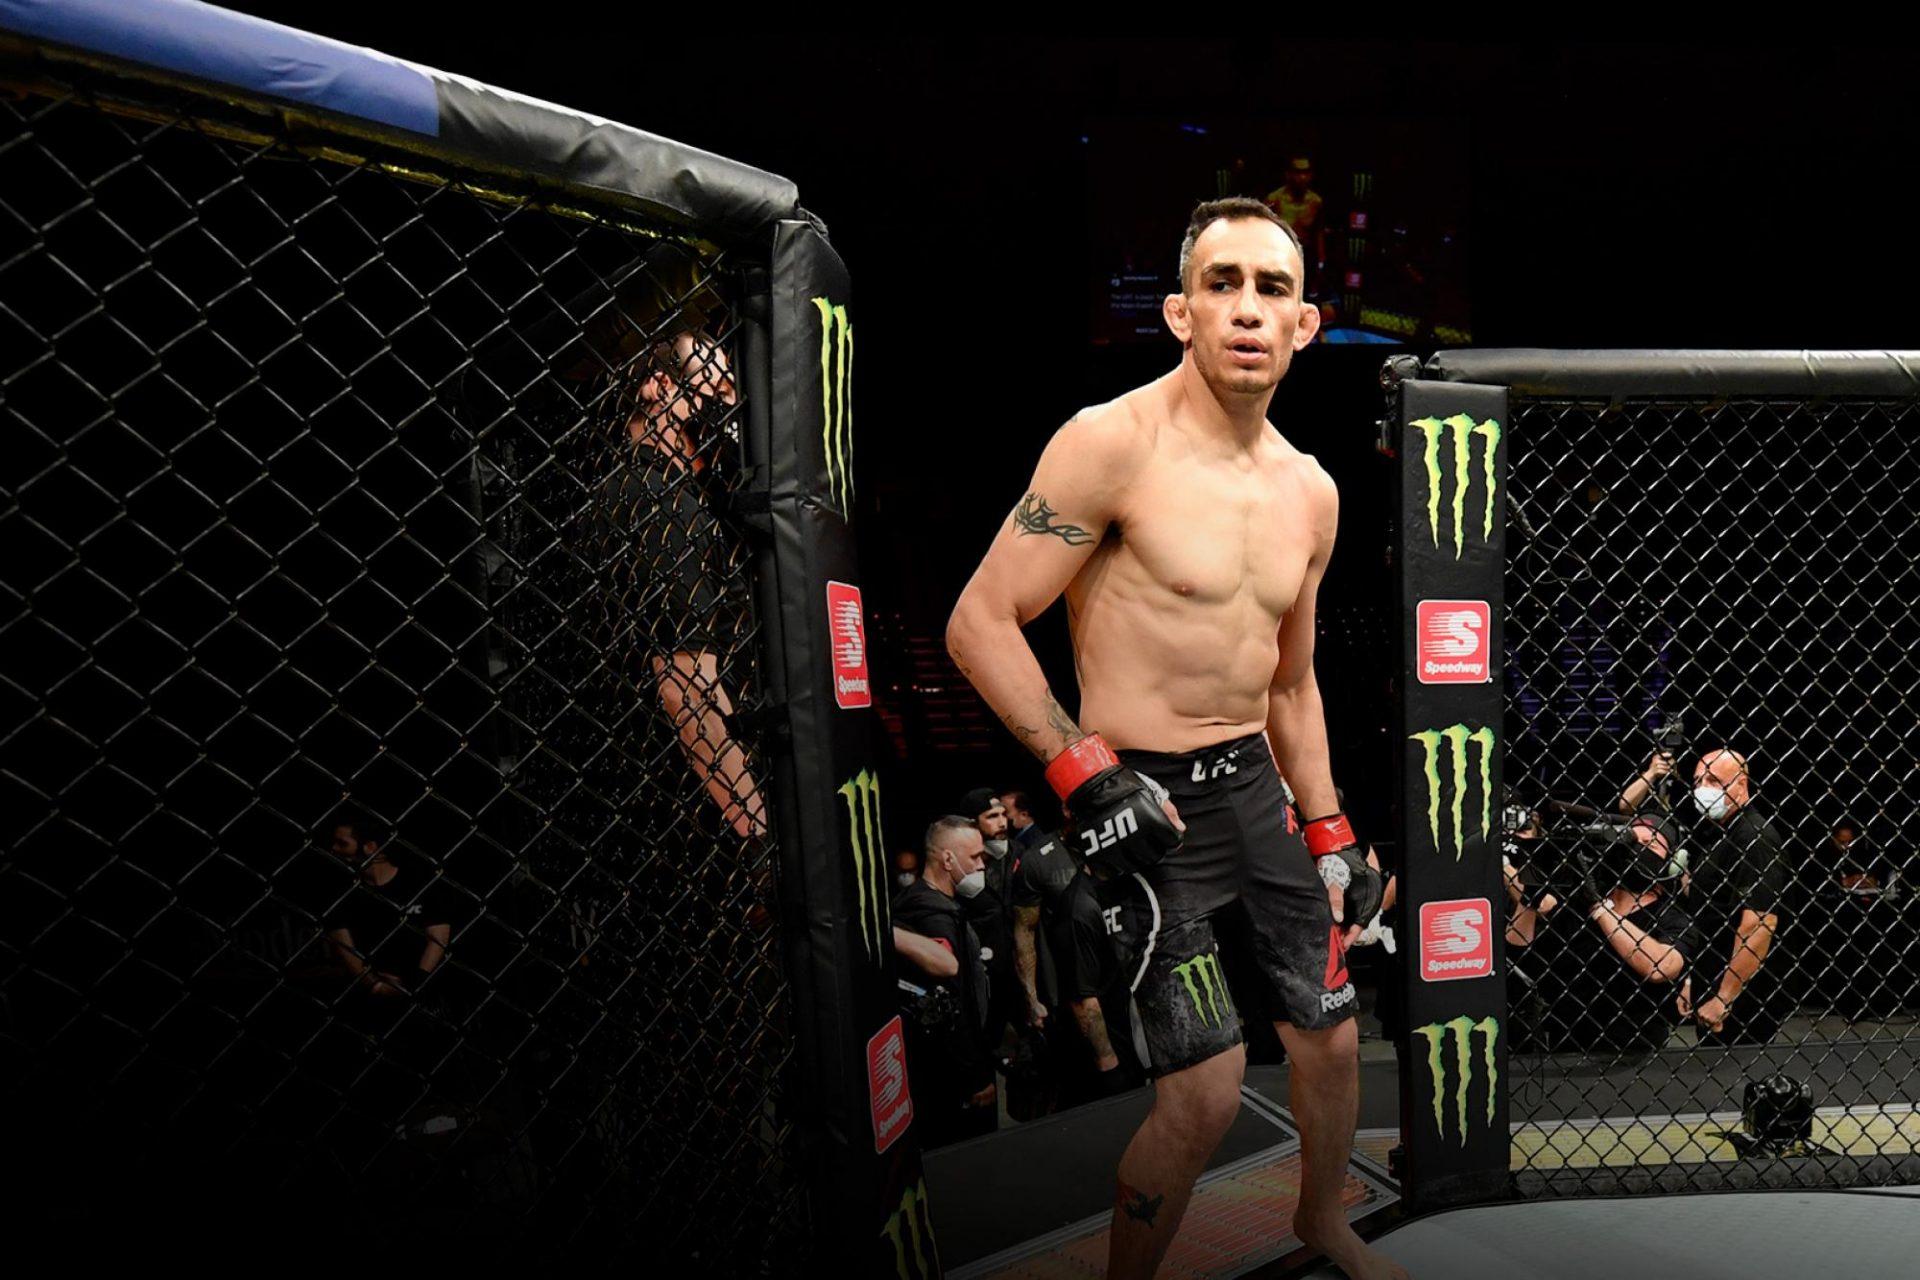 Tony Ferguson issues statement following loss to Charles Oliveira at UFC 256 - Tony Ferguson